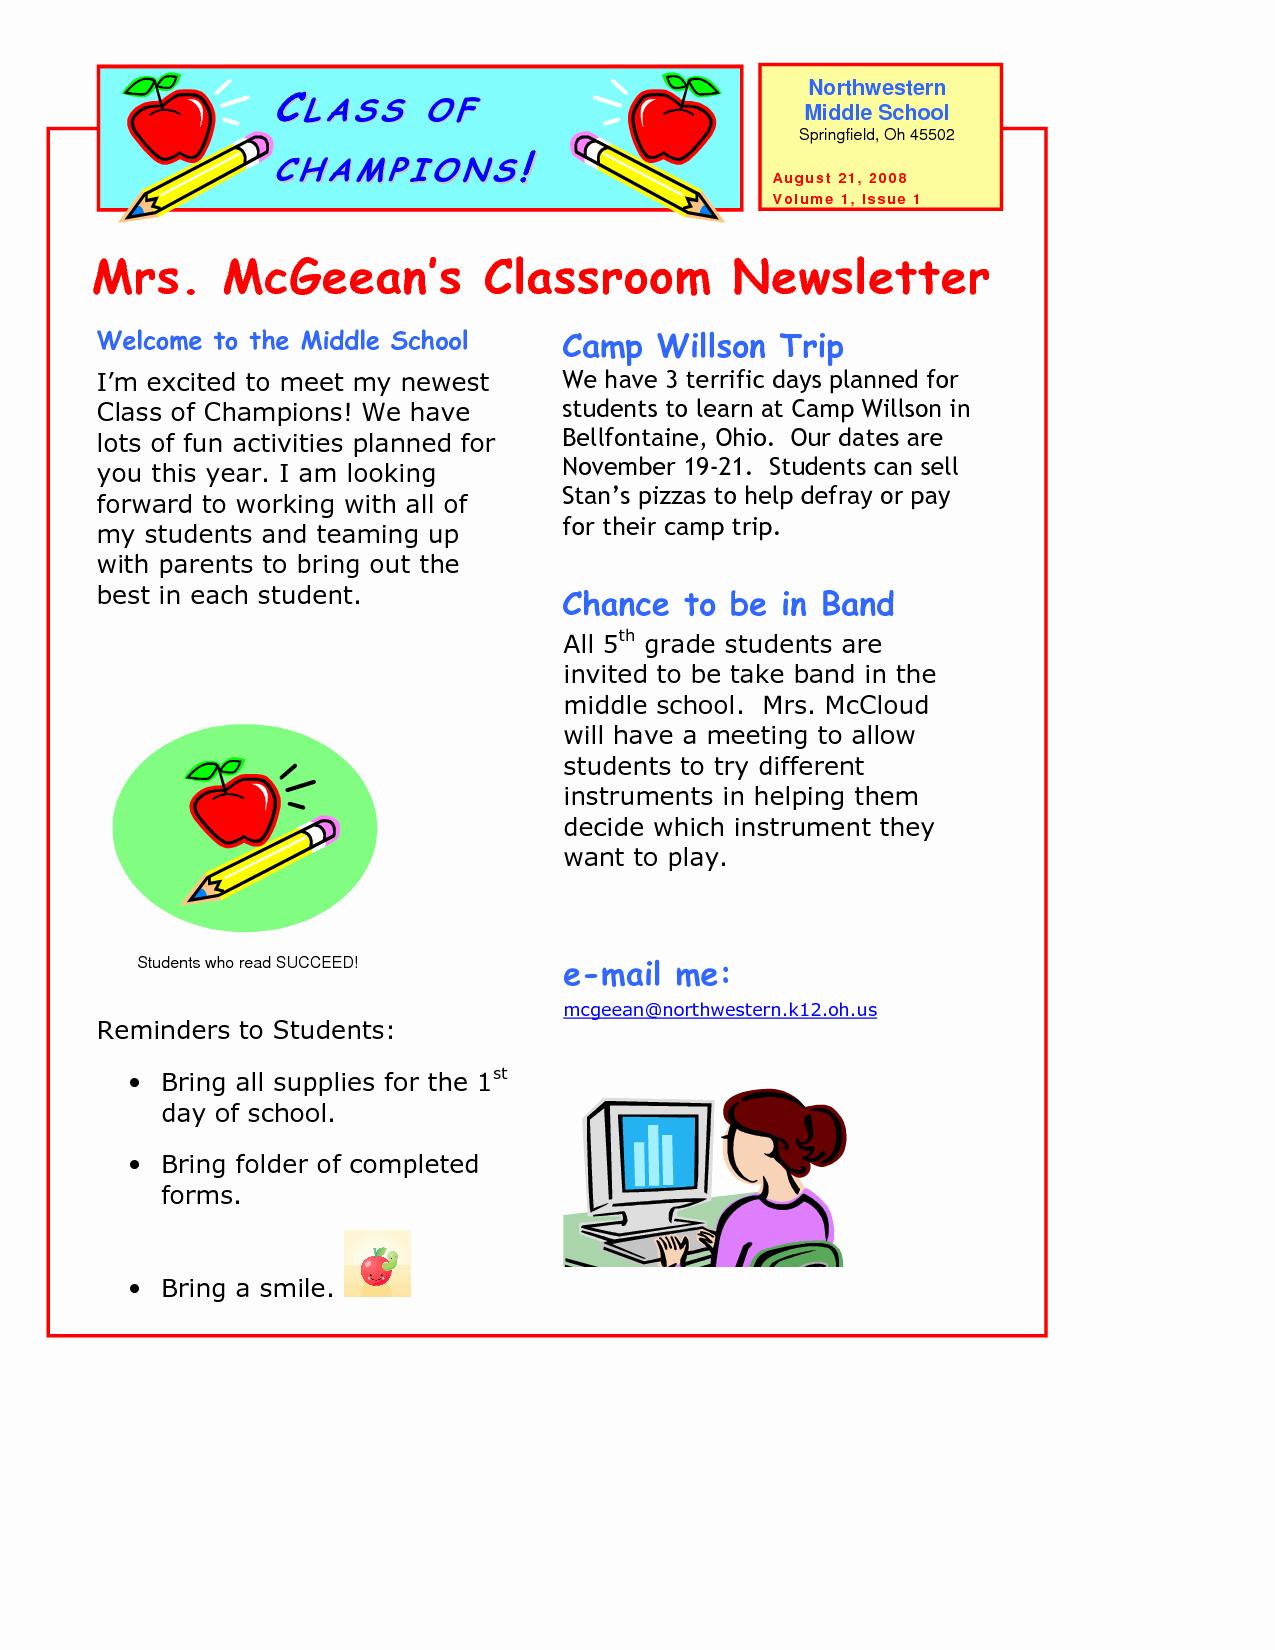 Parent Newsletter Template for Teachers Unique Classroom Newsletter Template